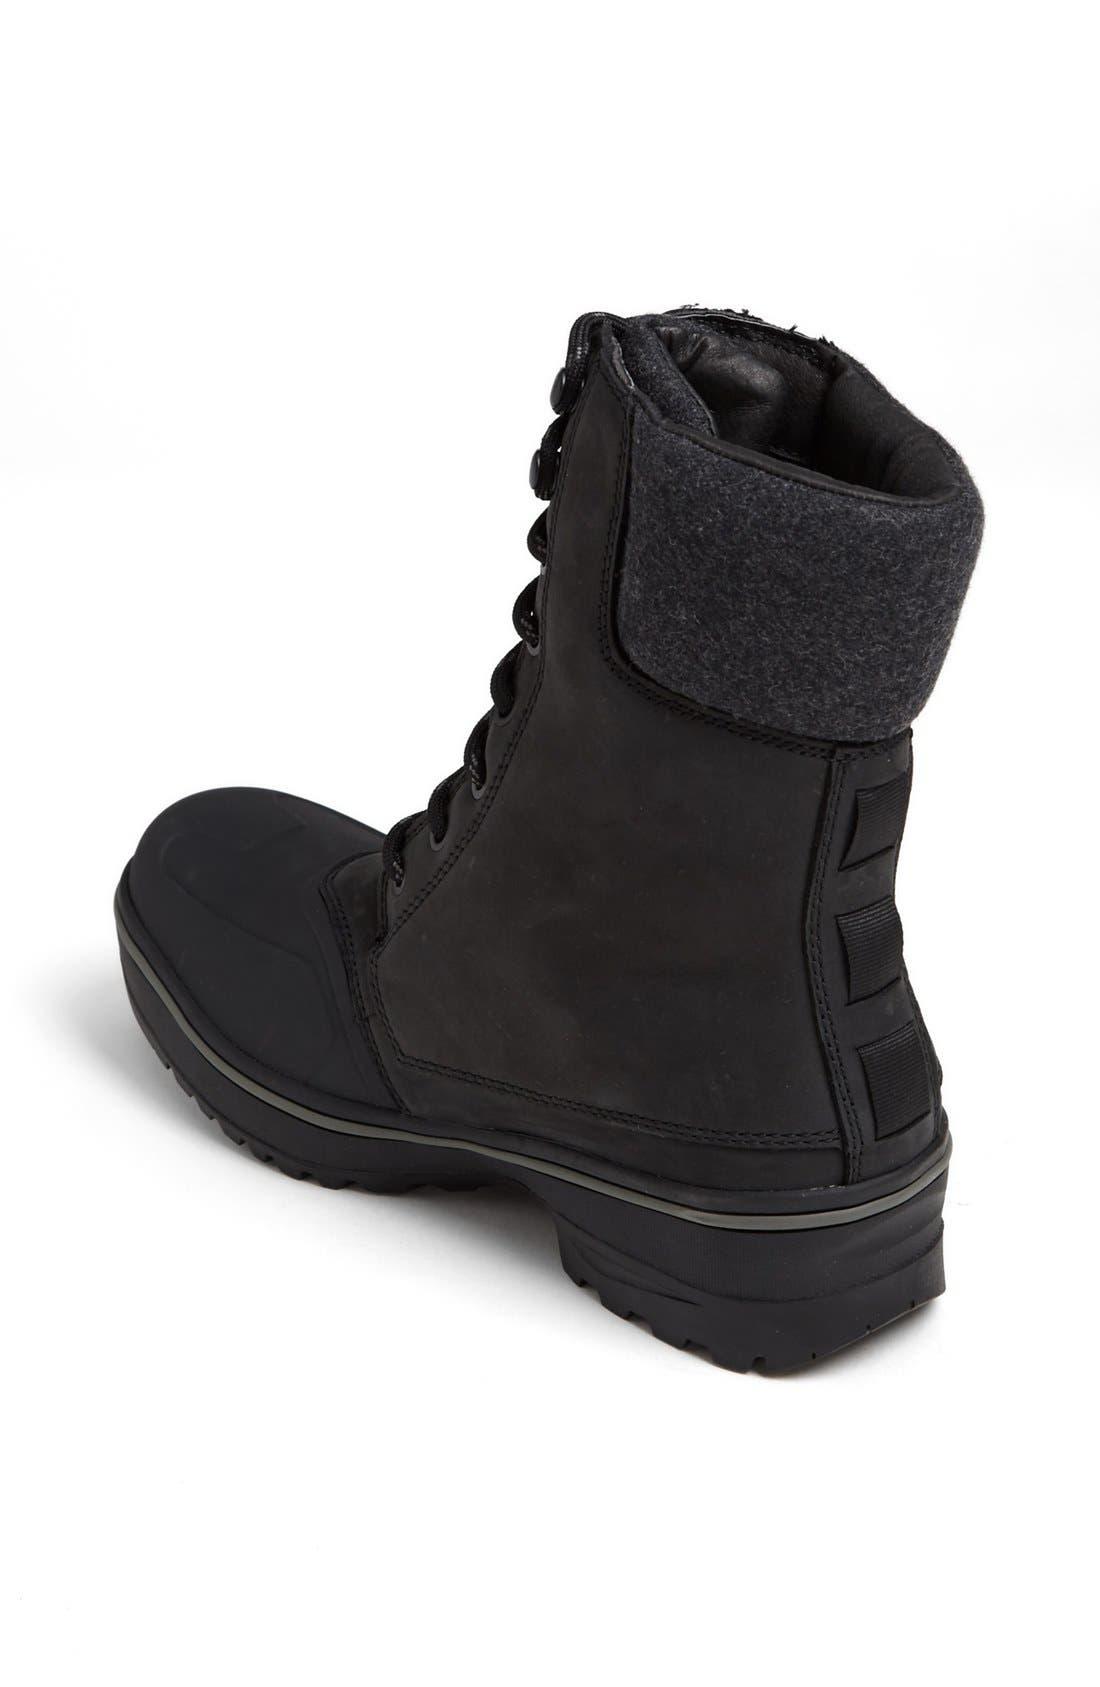 Alternate Image 2  - The North Face 'Shellisto' Snow Boot